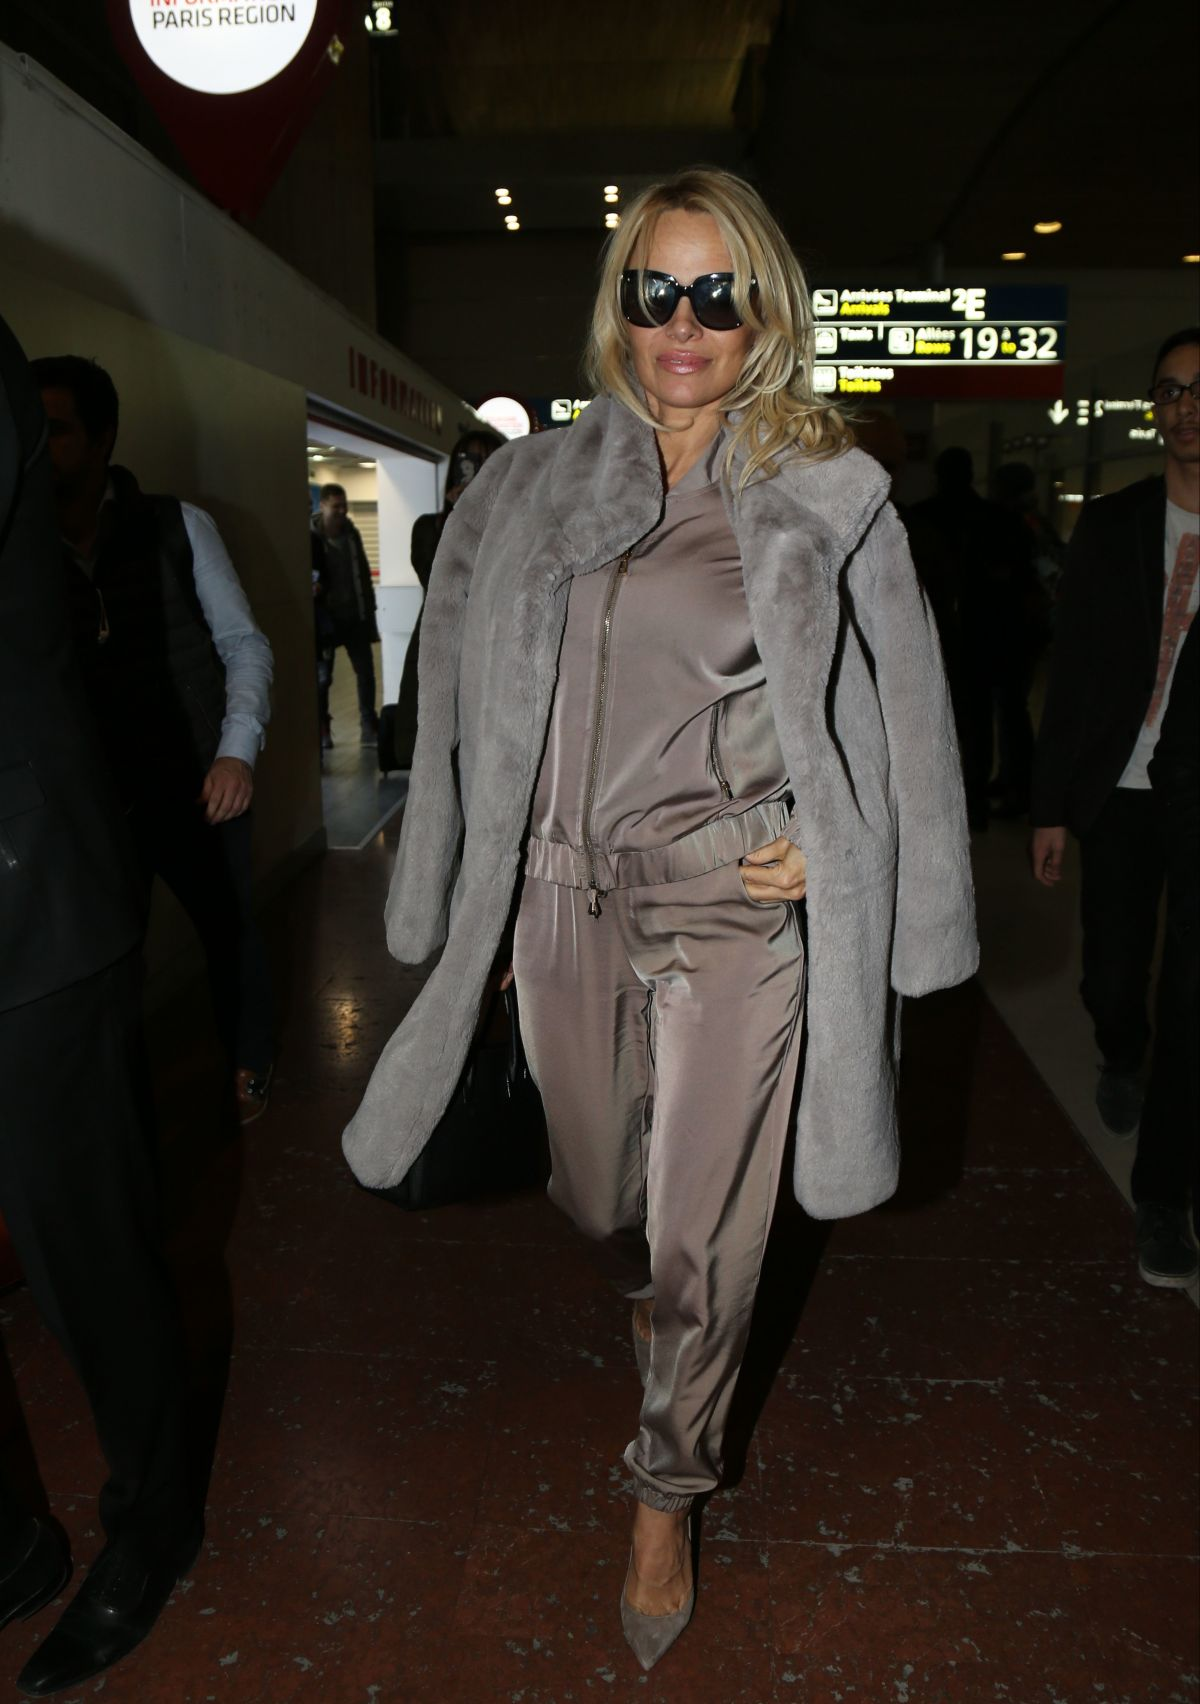 PAMELA ANDERSON at Charles De Gaulle Airport in Paris 12/17/2016